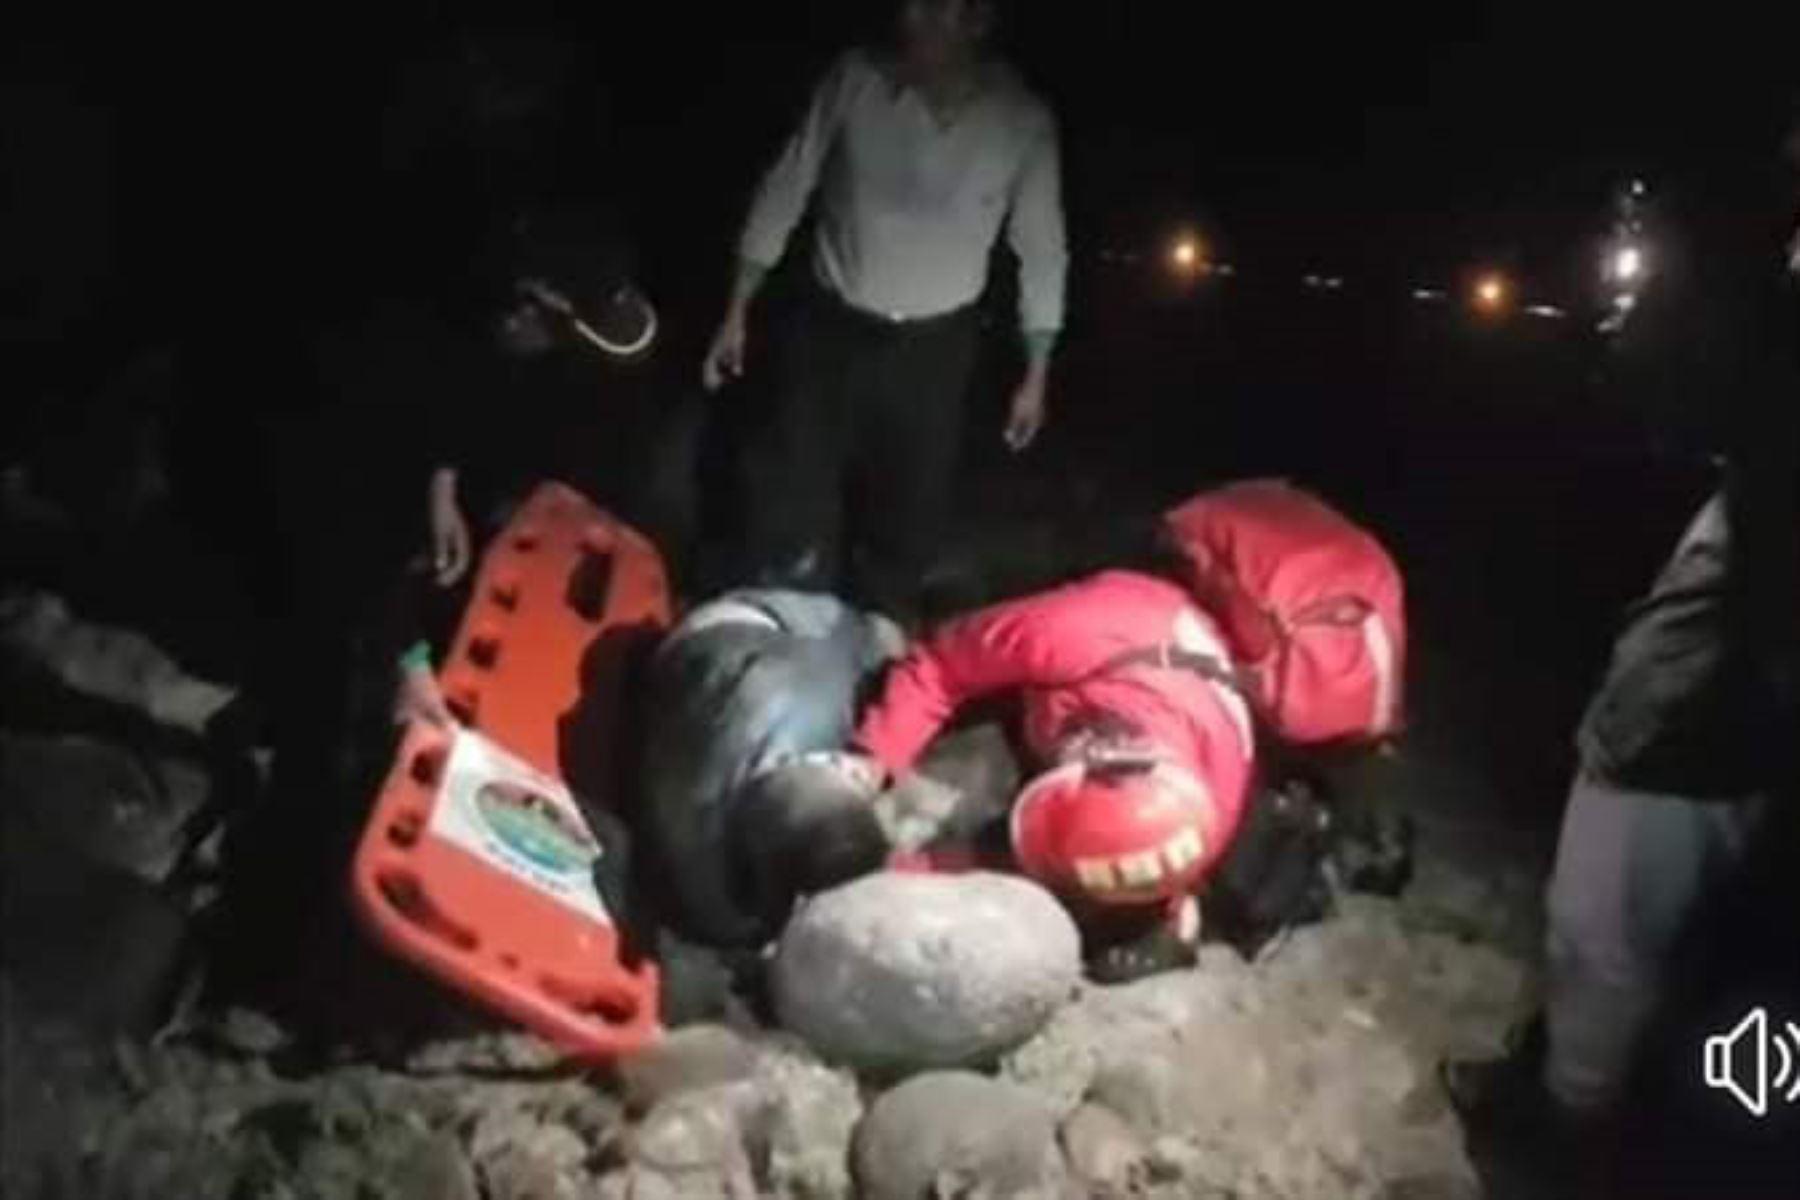 Seis personas murieron esta madrugada tras caída de un bus a un abismo en Arequipa. Foto: Facebook/Hugo C Suarez Vega